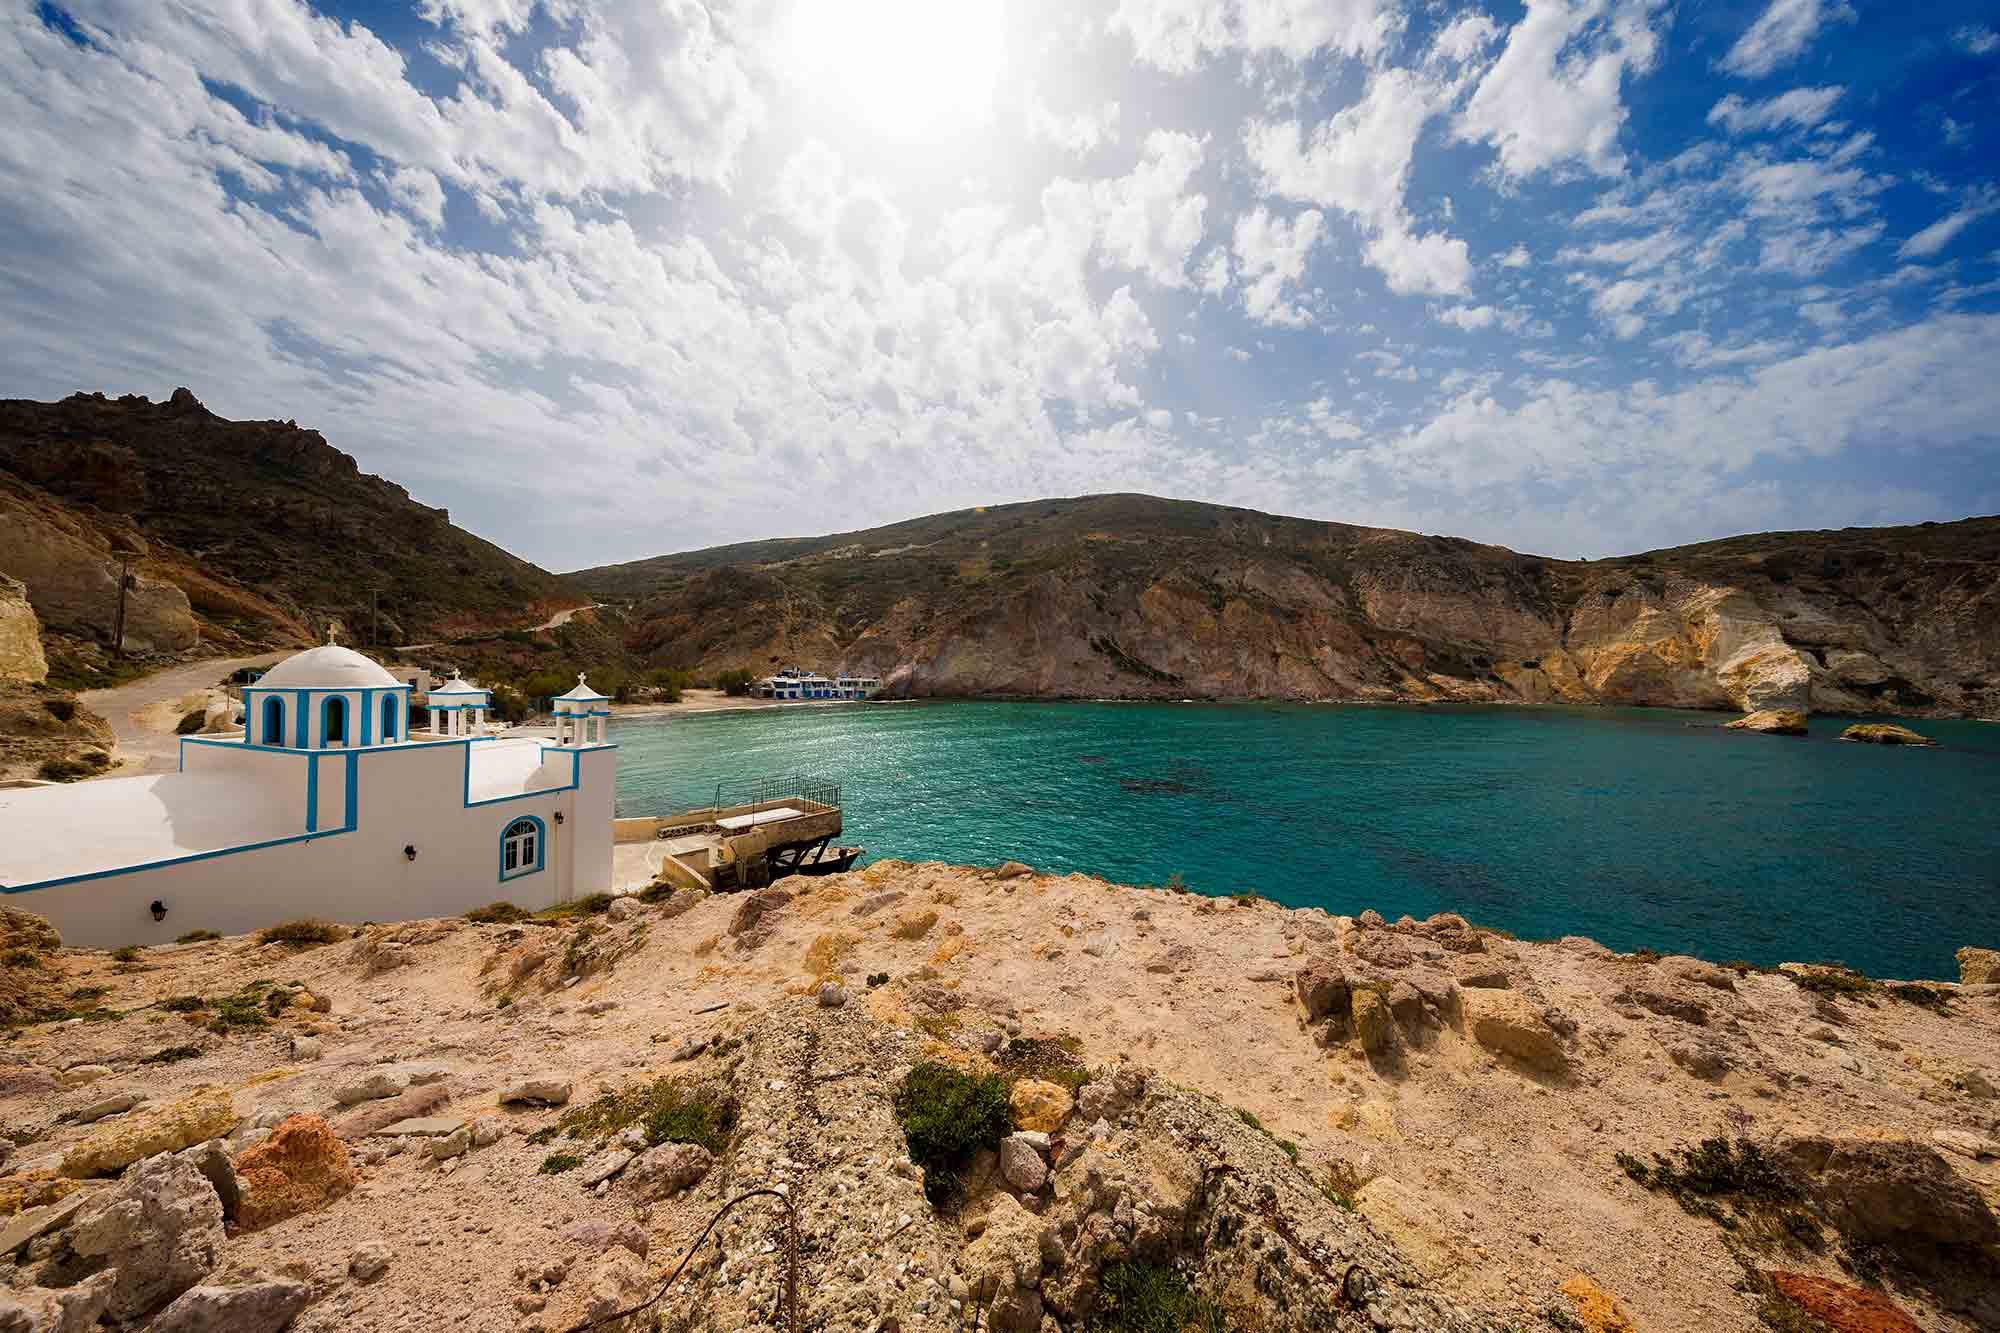 Firopotamos beach on Milos island. © ULLI MAIER & NISA MAIER